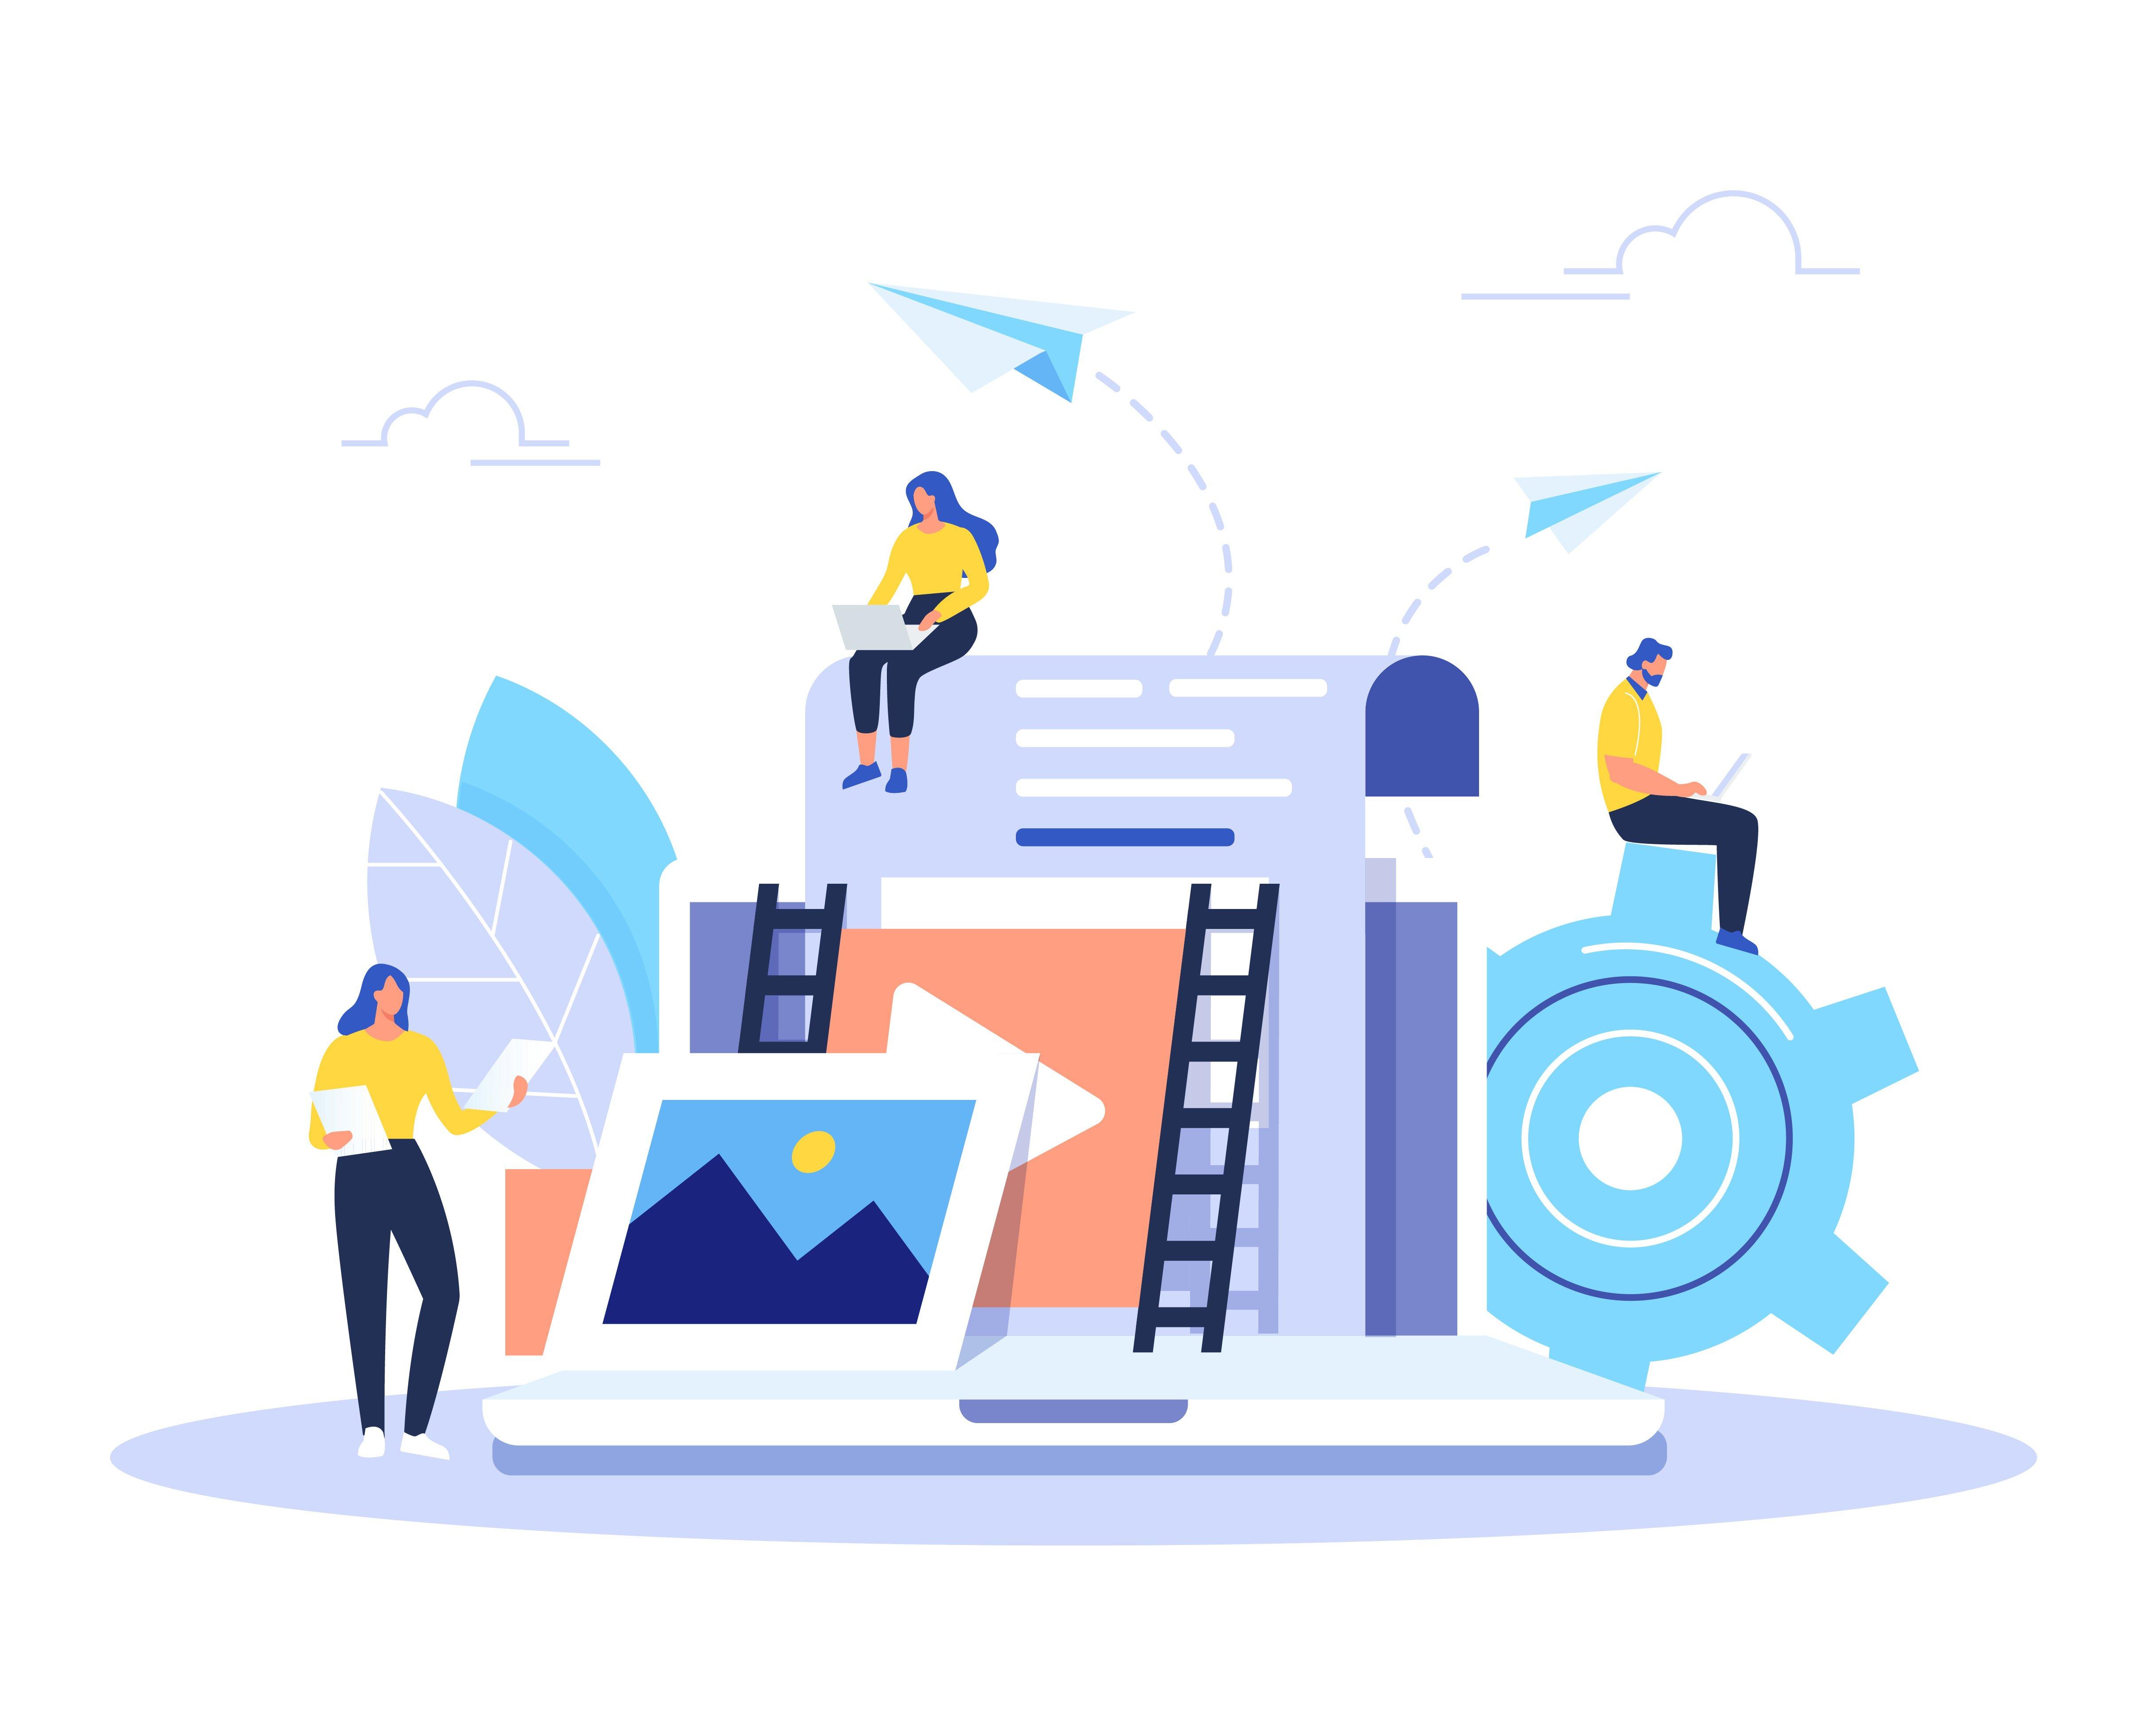 BtoBの中小企業やスタートアップがWebにチャネルを構築するノウハウ_1